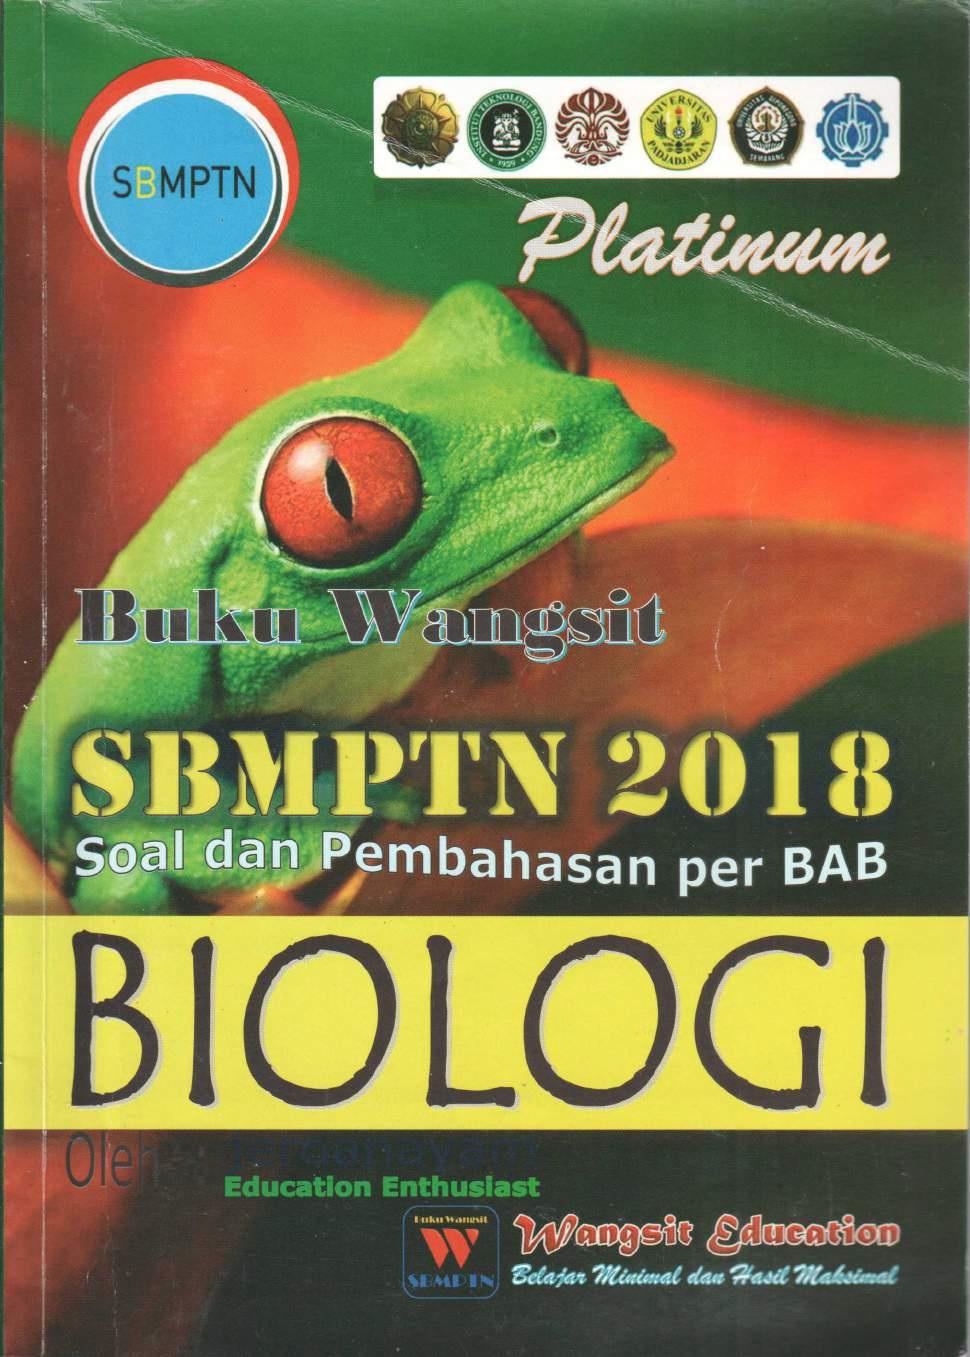 Buku Wangsit SBMPTN 2018 Biologi (Soal dan Pembahasan per BAB)